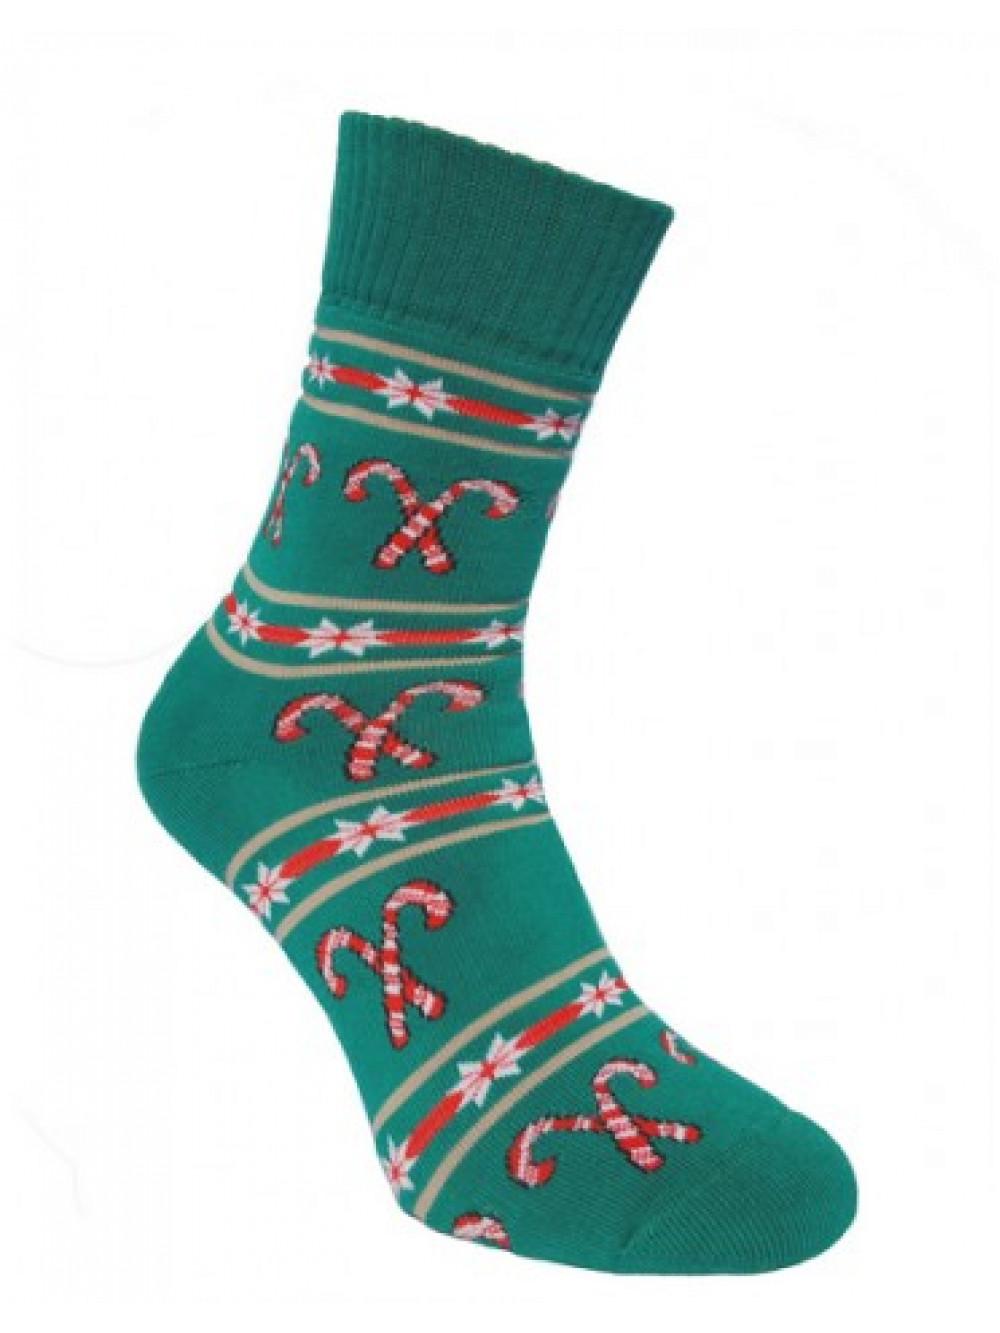 Ponožky Foxysoxy Vianočné Cukrovinky Zelené